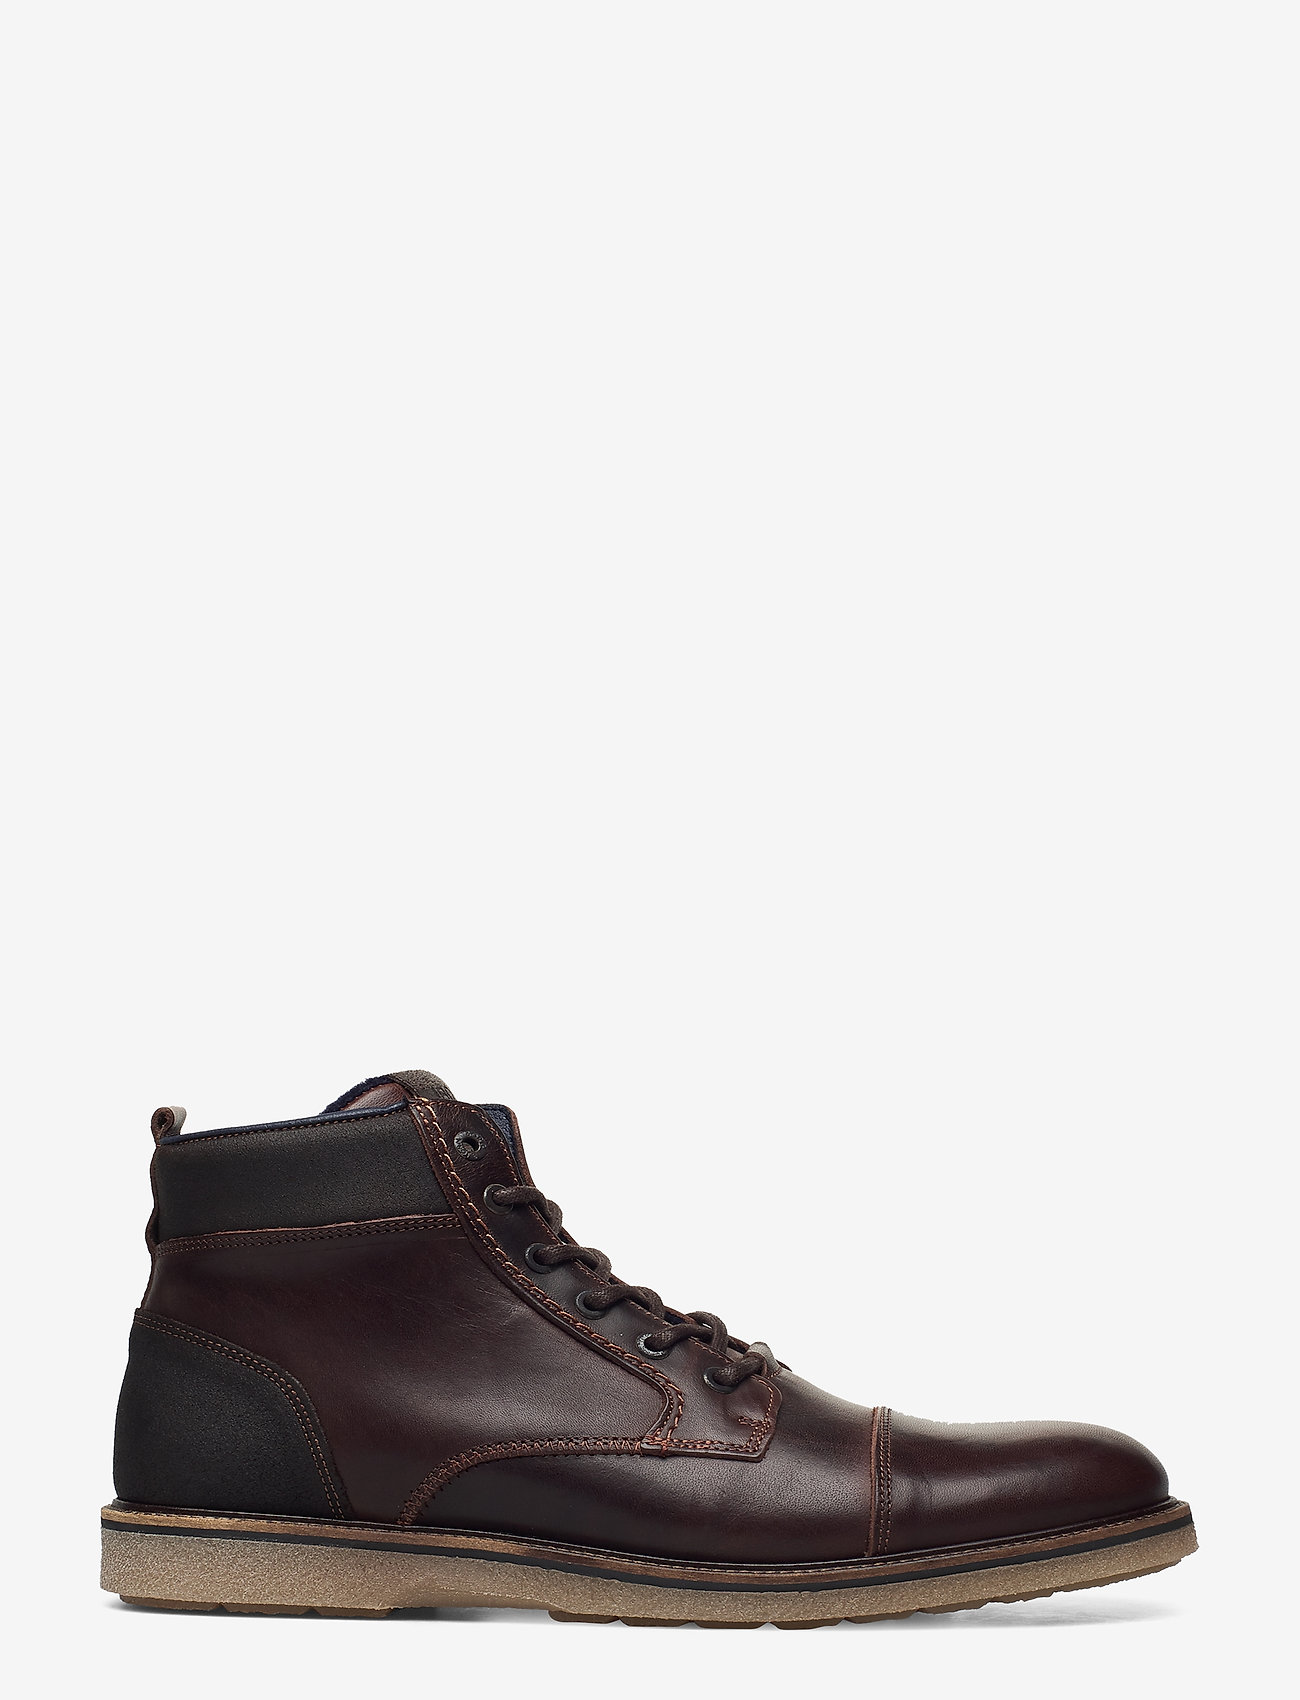 Björn Borg - BARLOW HGH M - laced boots - dark brown - 1